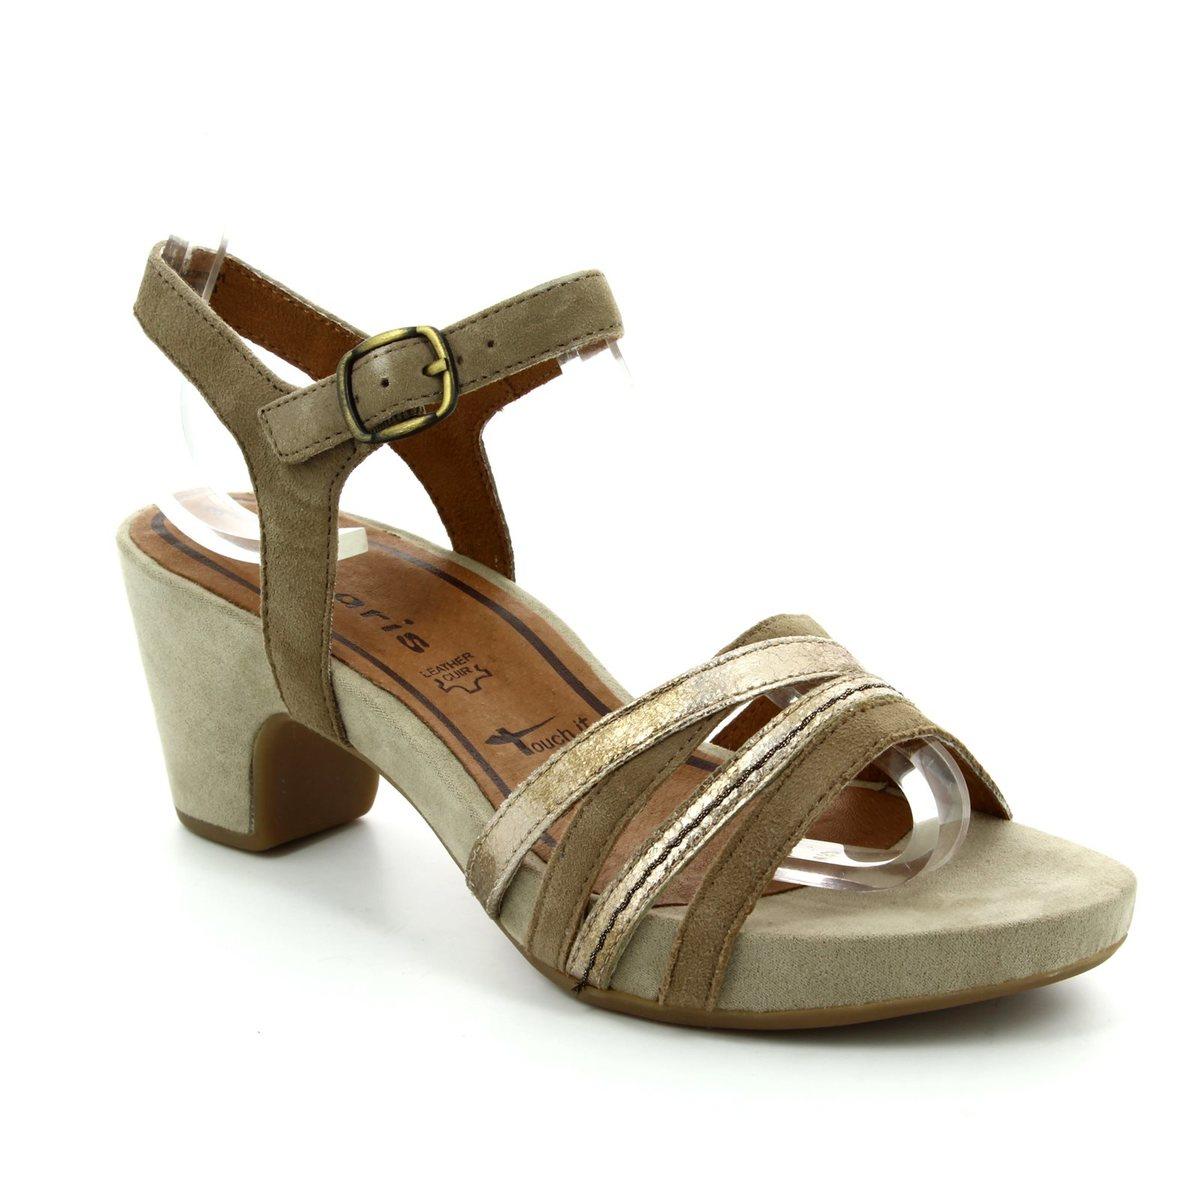 d7e3b0b0a5c4 Tamaris Heeled Sandals - Taupe multi - 28328 301 JULES